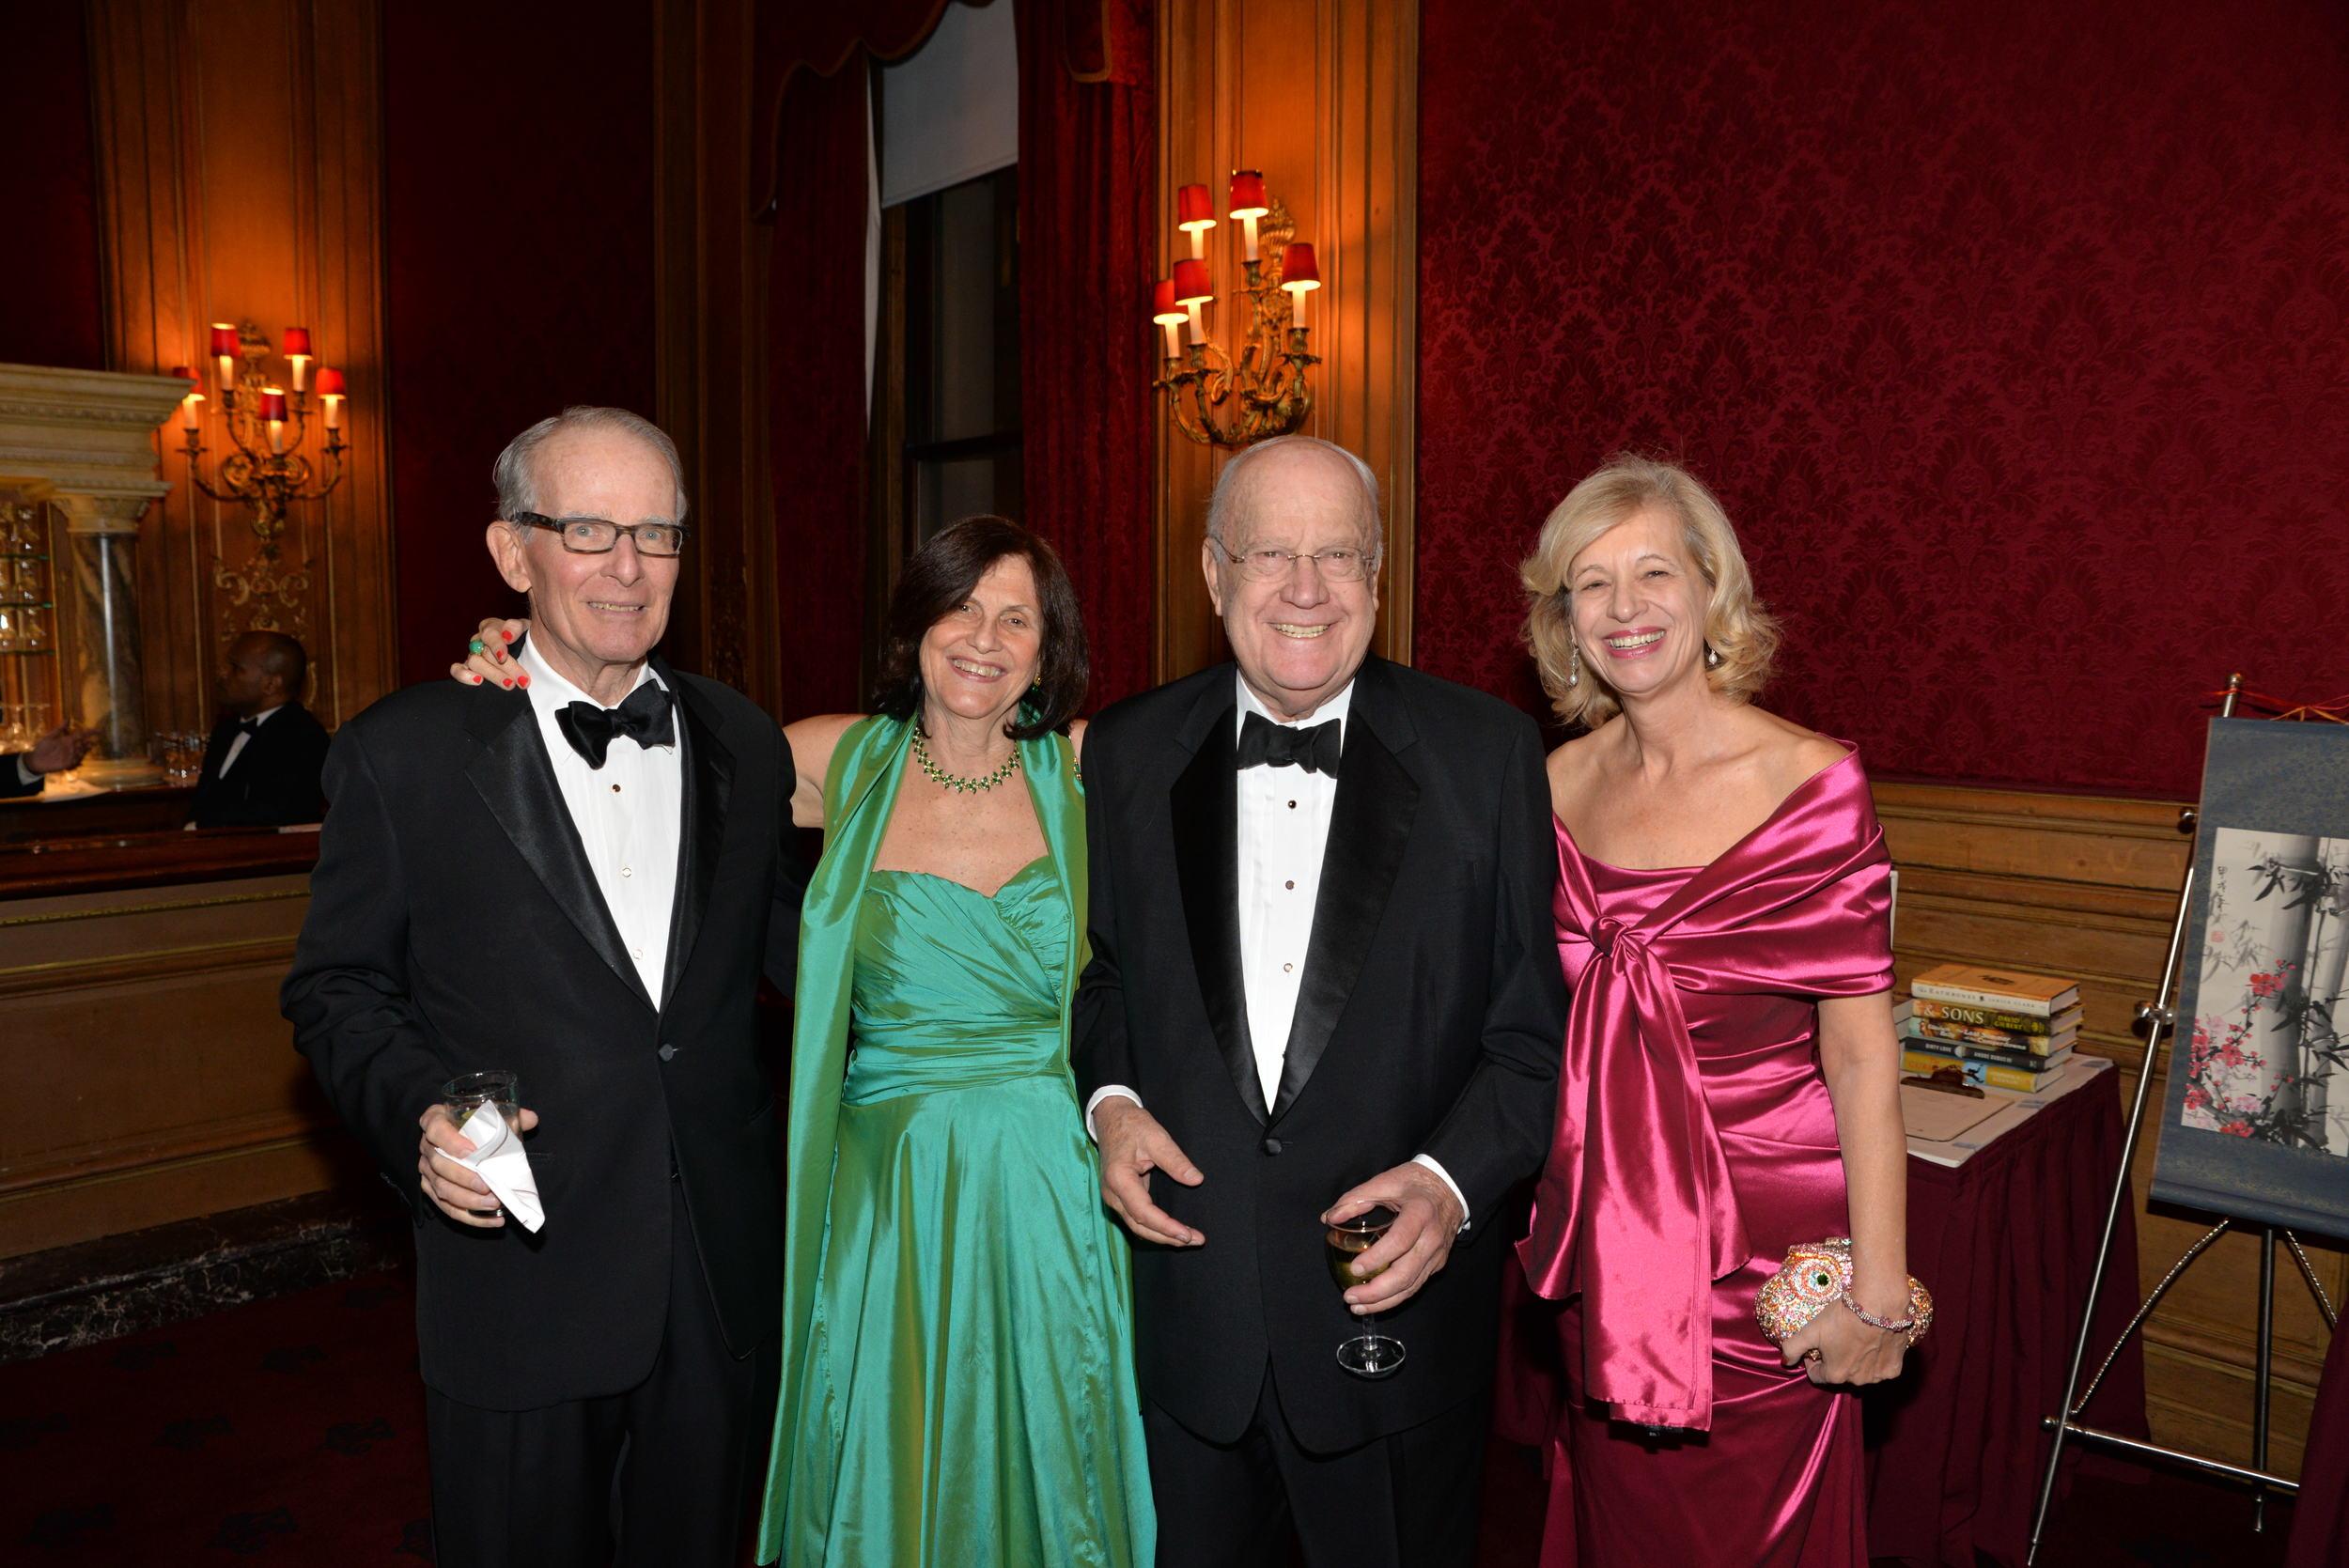 DSC_3460-Tad Ogden, Jan Ogden, Frederick B Whittenmore, Karen Bevan.JPG